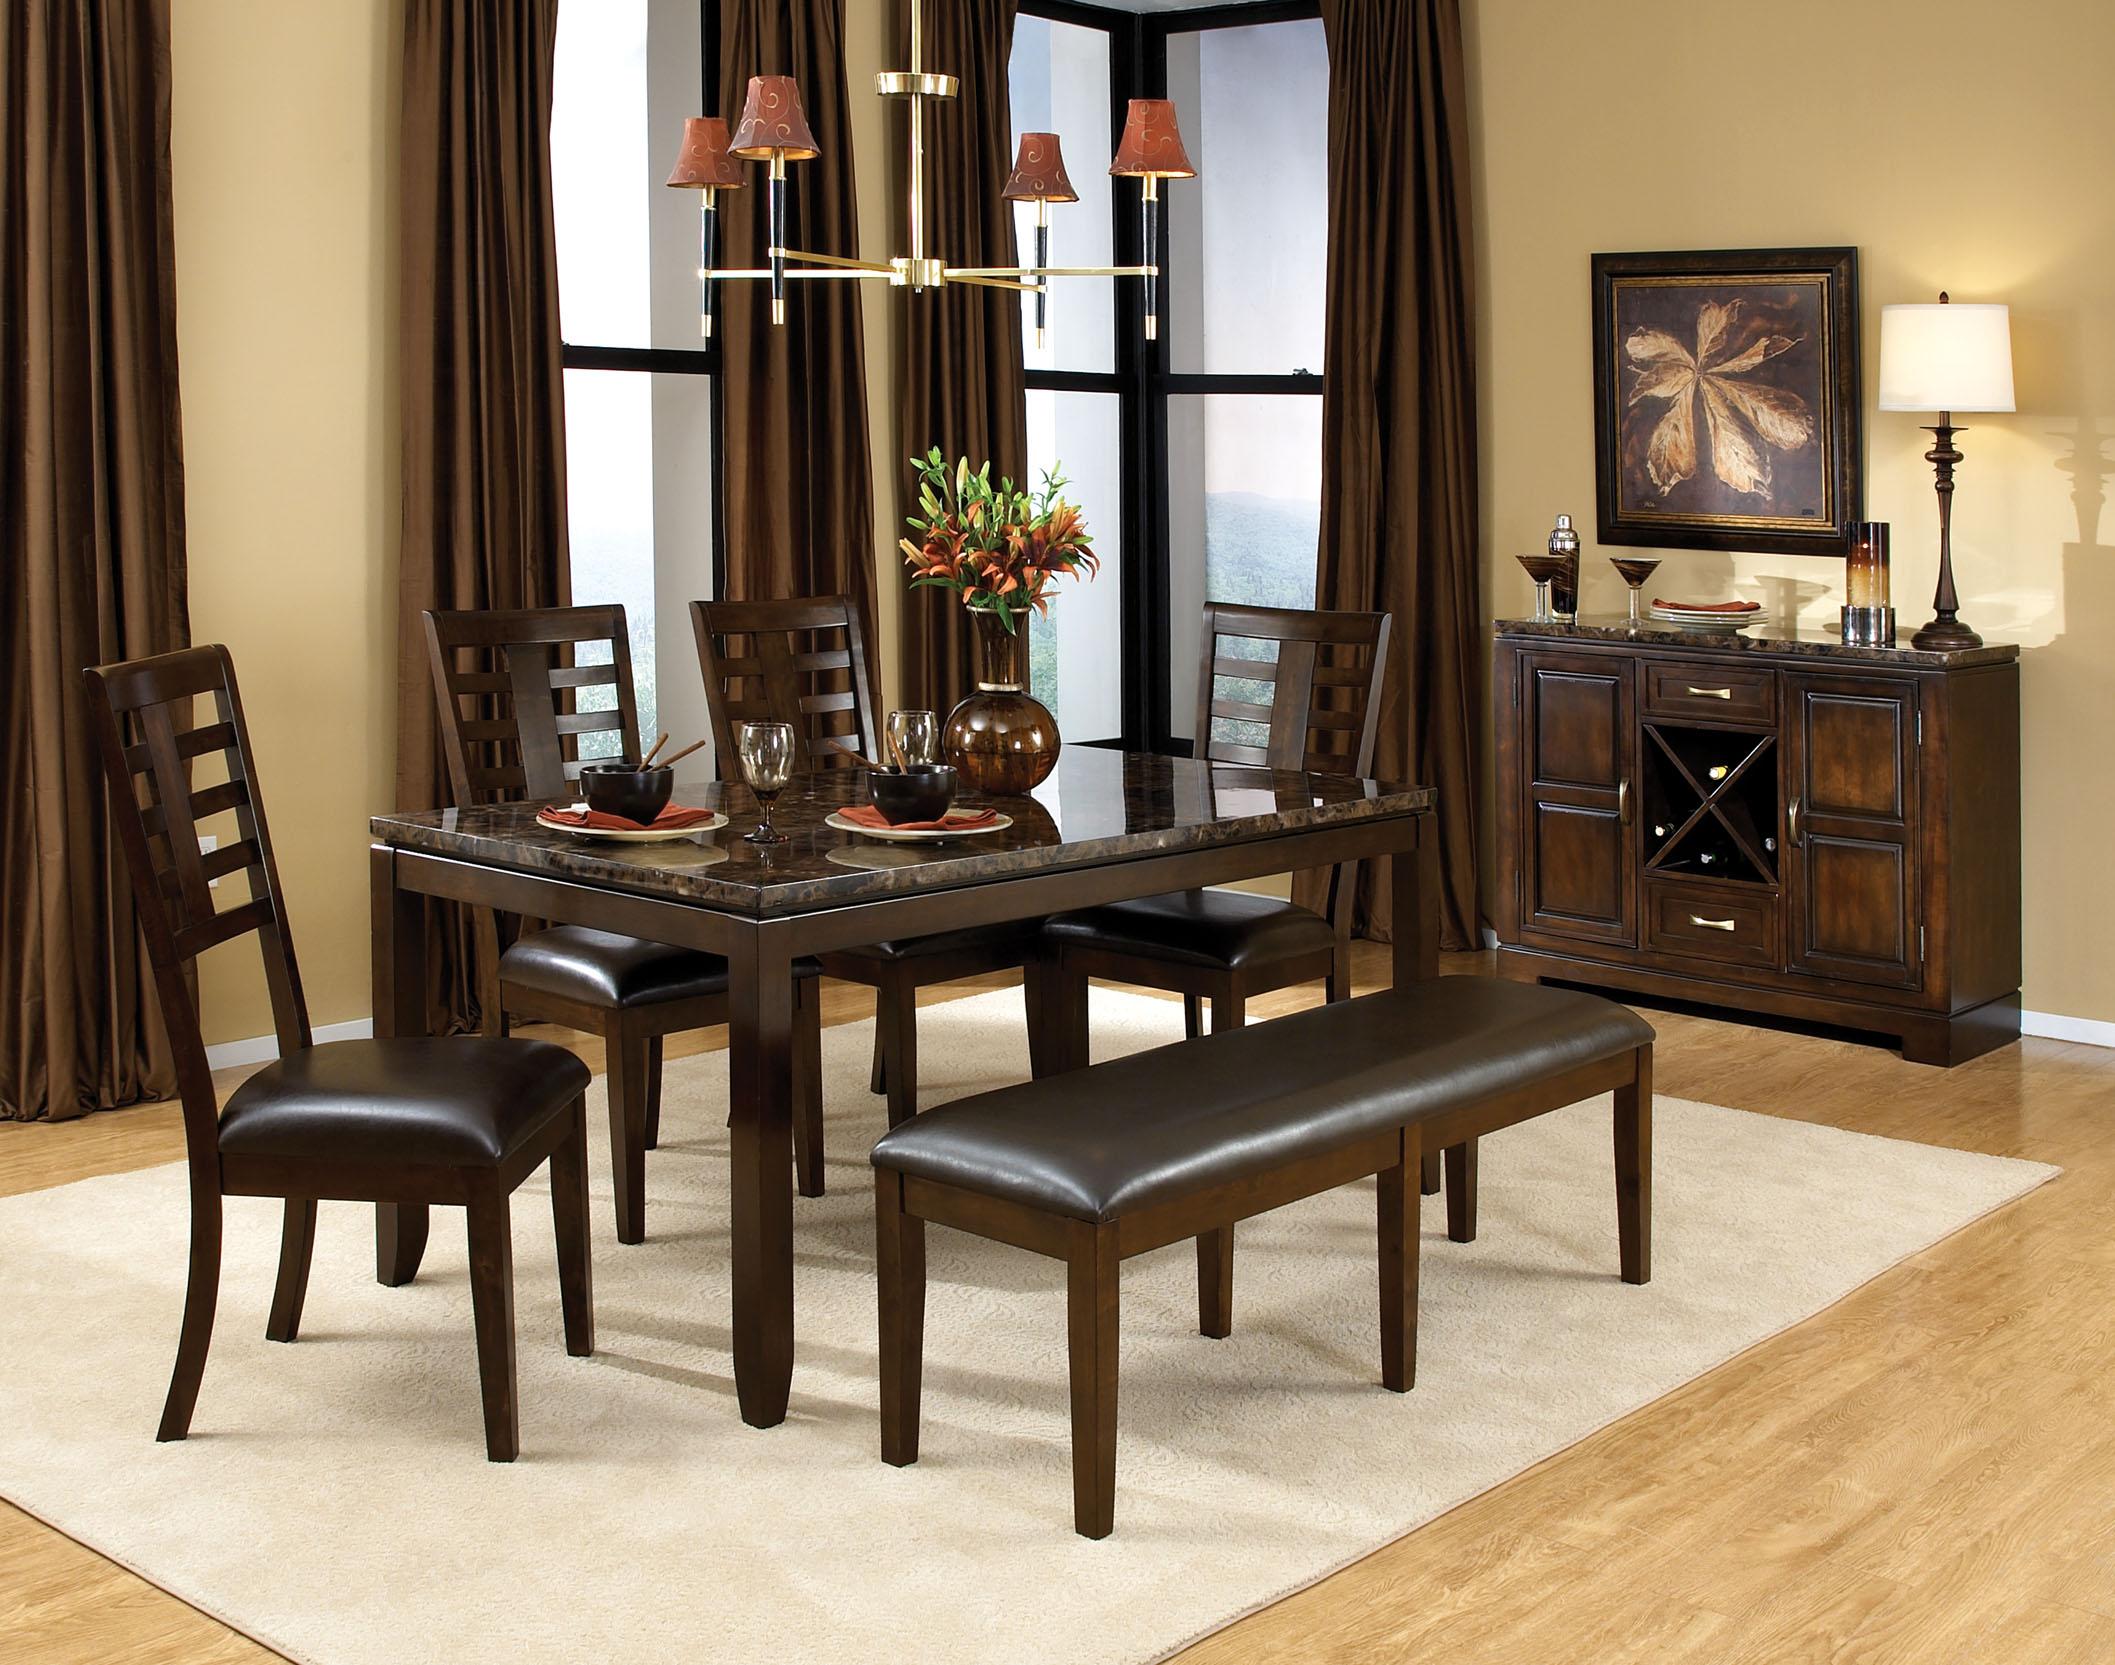 Standard Furniture Bella Dining Room 16840  Home Furniture